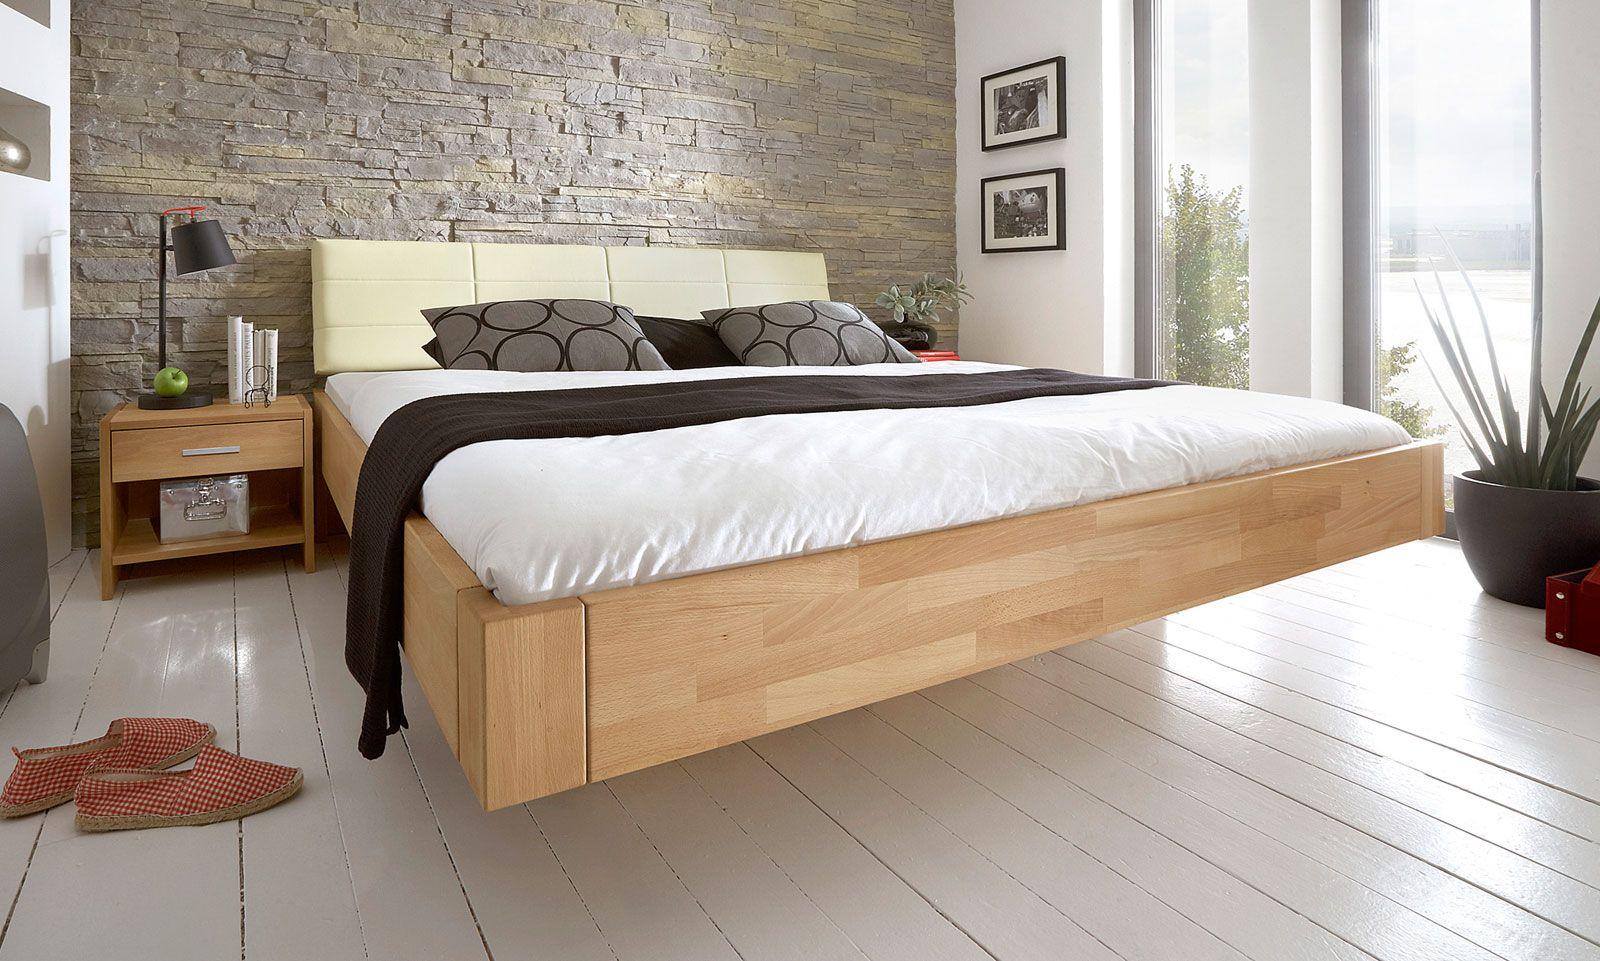 Full Size of Ein Bett Mit Schweberahmen Ist Immer Besonderer Blickfang So Bett Betten.de